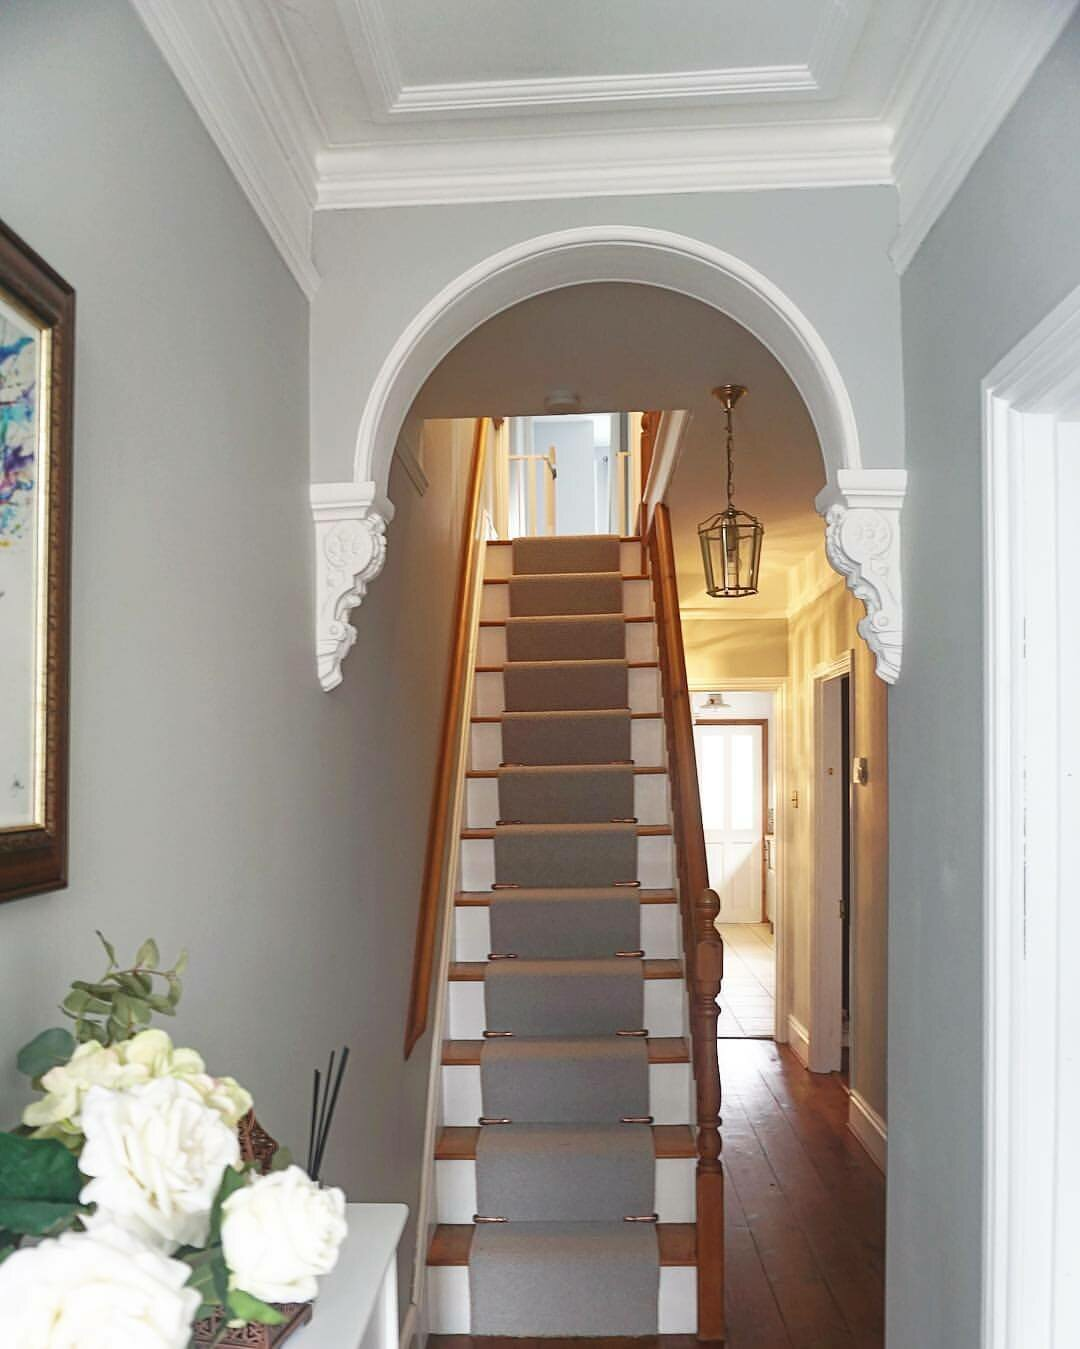 вариант стрижки арки порталы над лестницей картинки для сублимационной